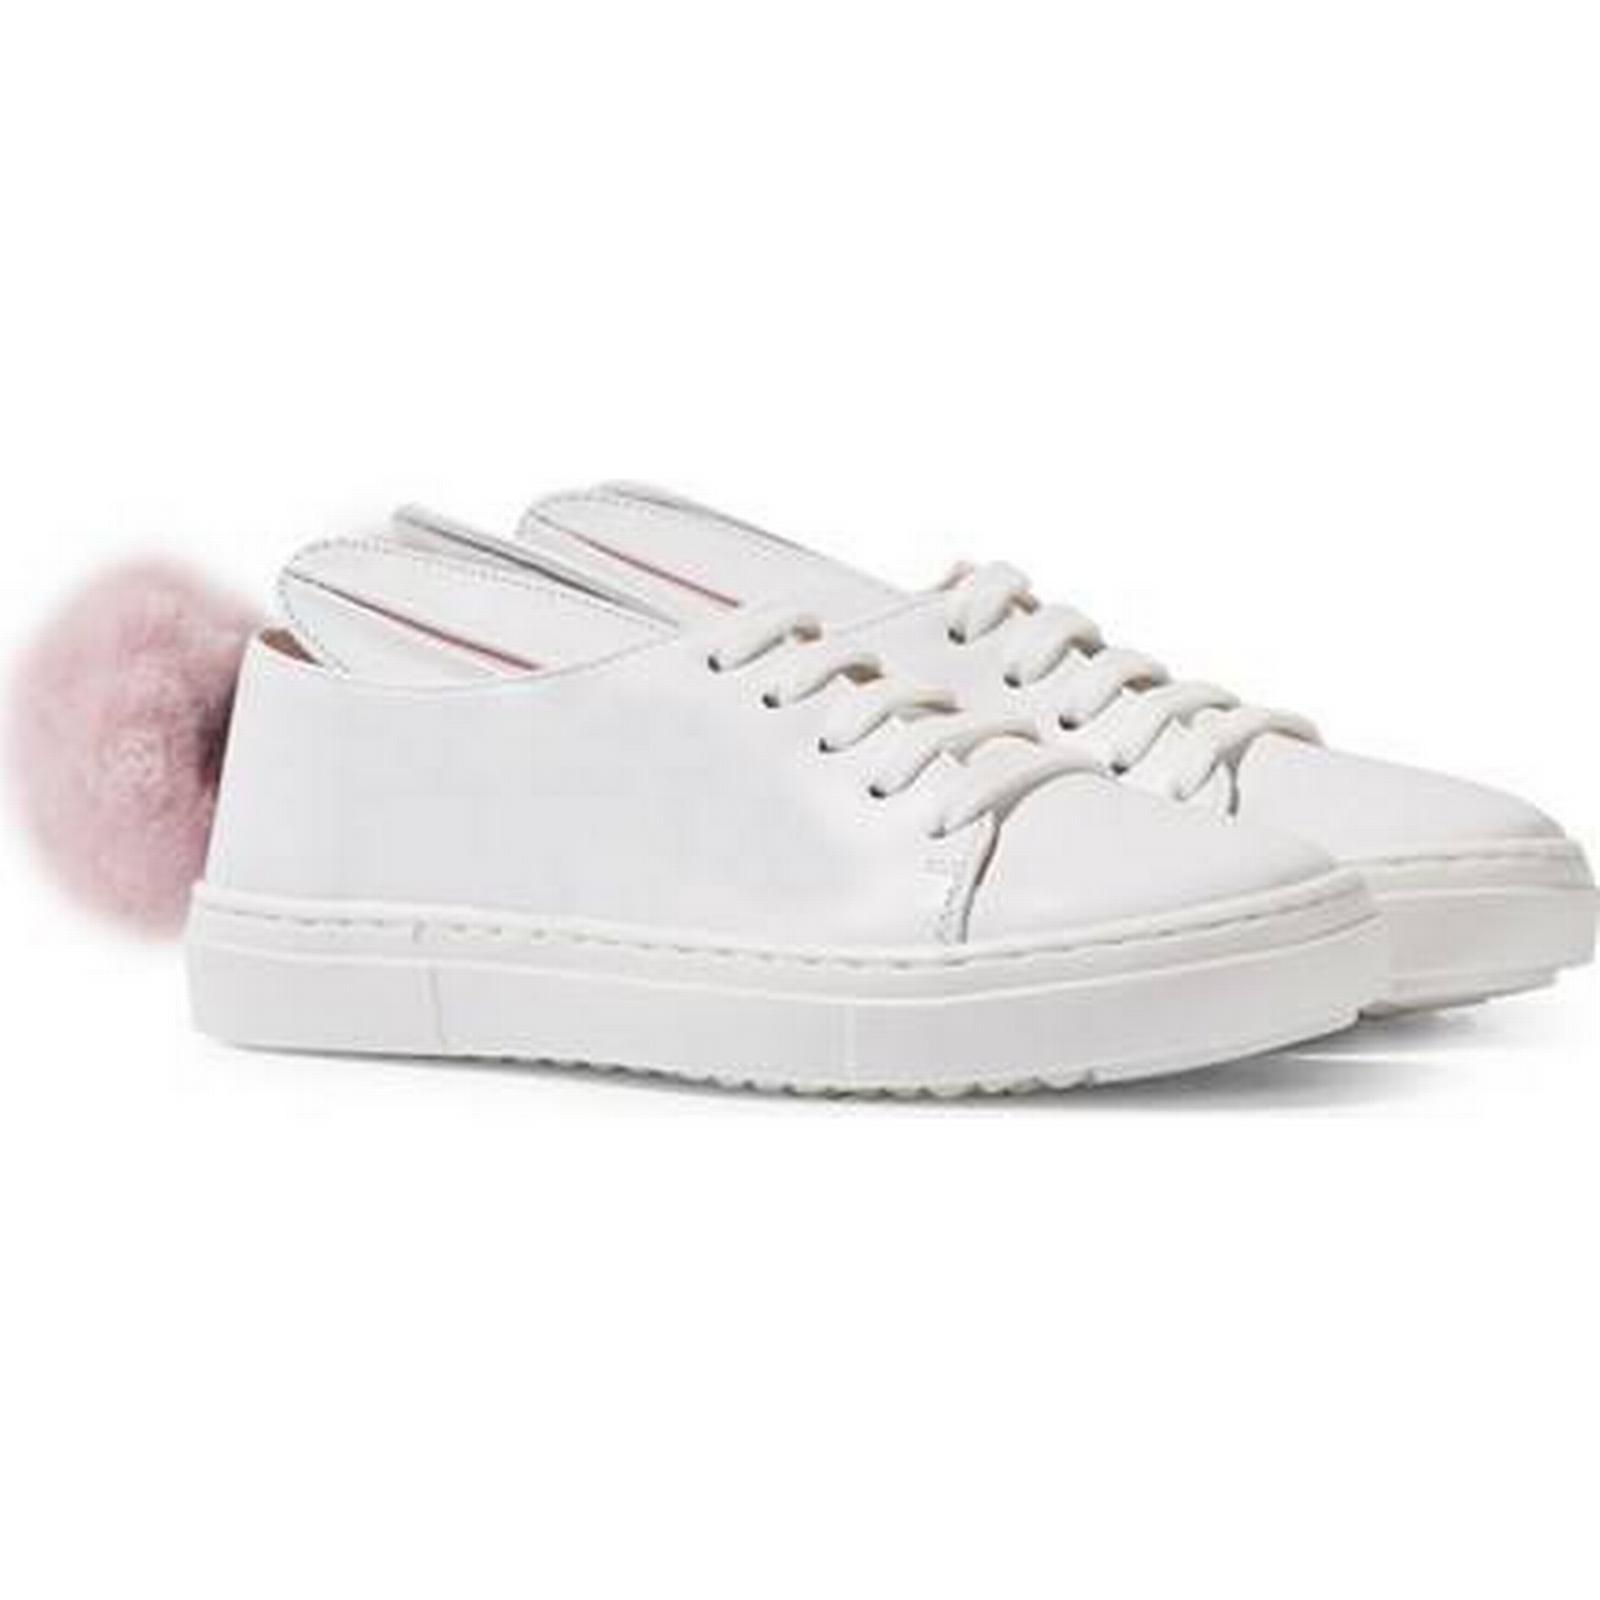 White Trainers Leather Bunny Pom Pom Trainers White f2df8c